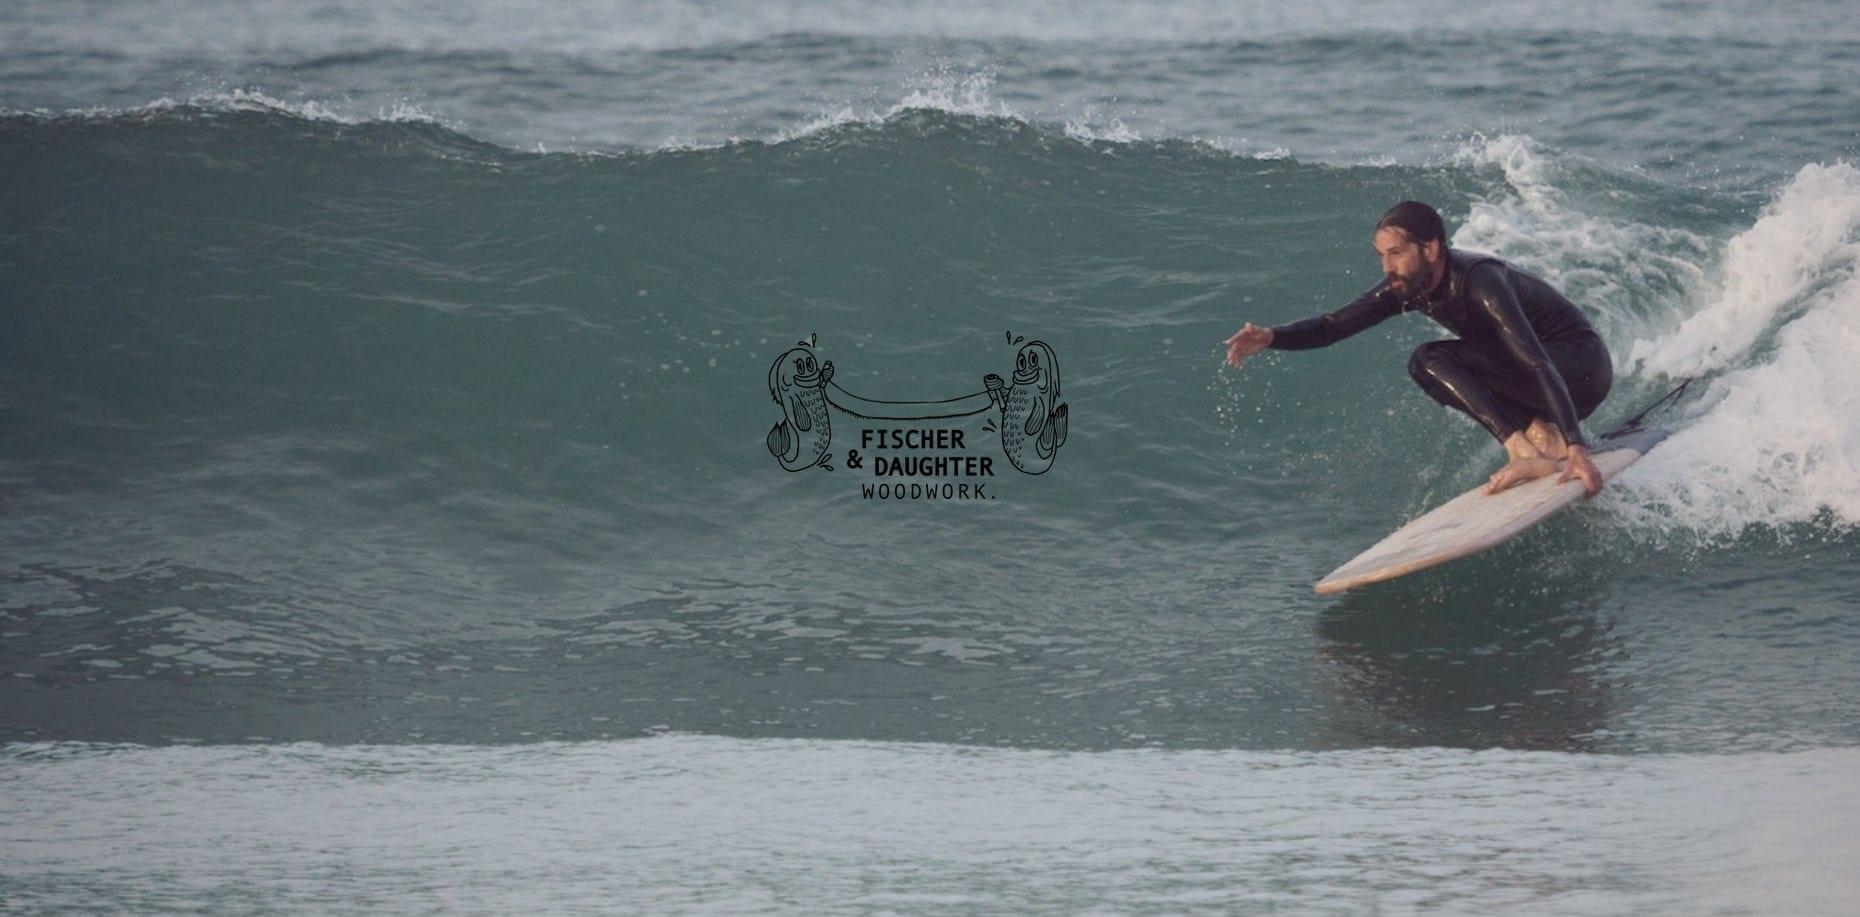 fischer-daughter-surfboards